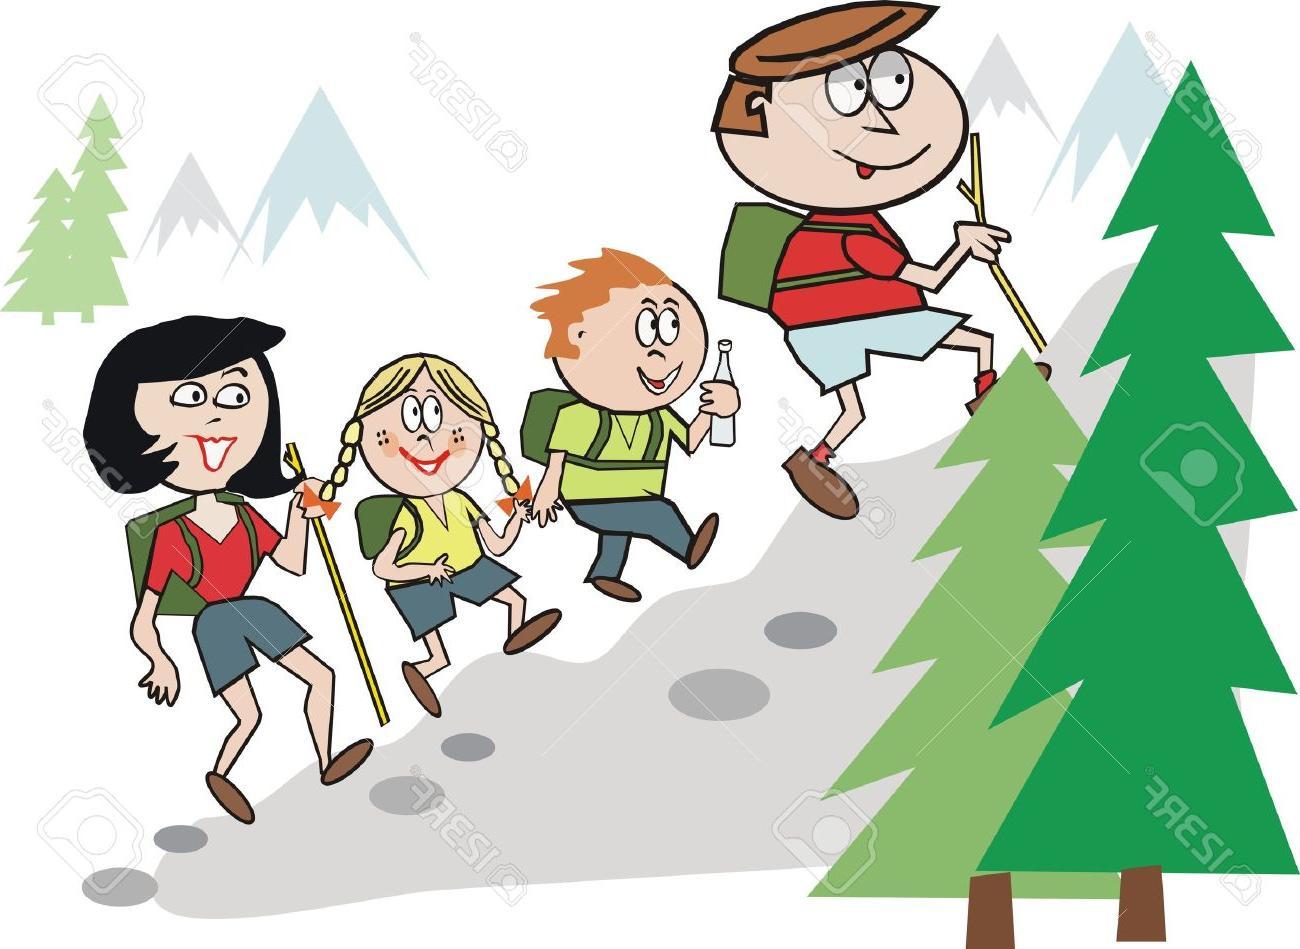 Hiking cartoons clipart clip freeuse Unique Funny Hiking Cartoon Vector Library » Free Vector Art ... clip freeuse